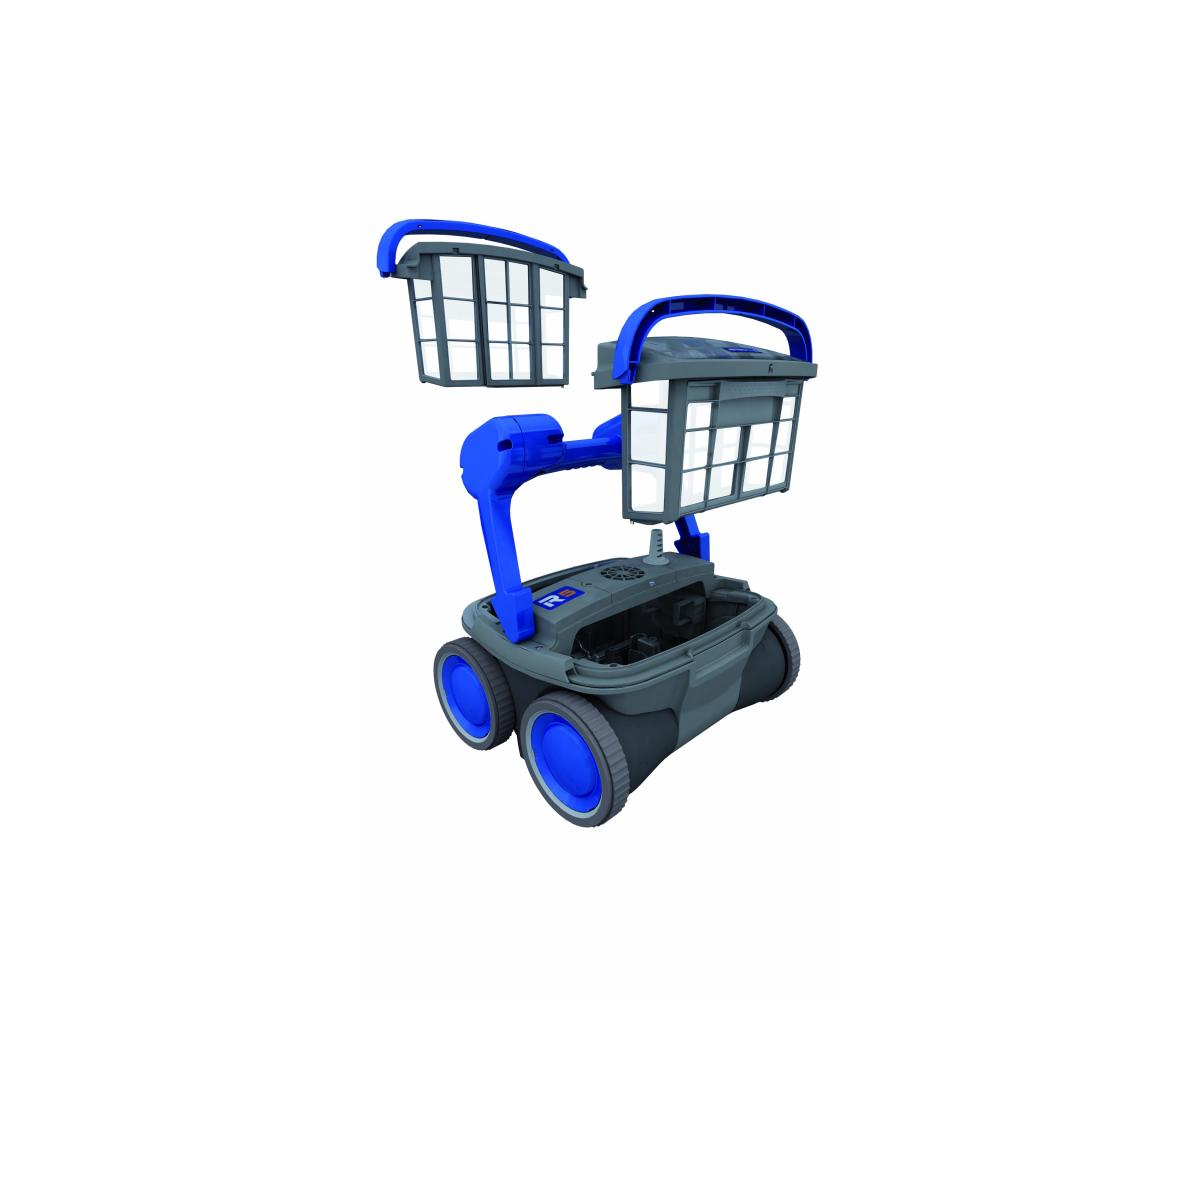 Astralpool Robot limpiafondos R3 para suelo